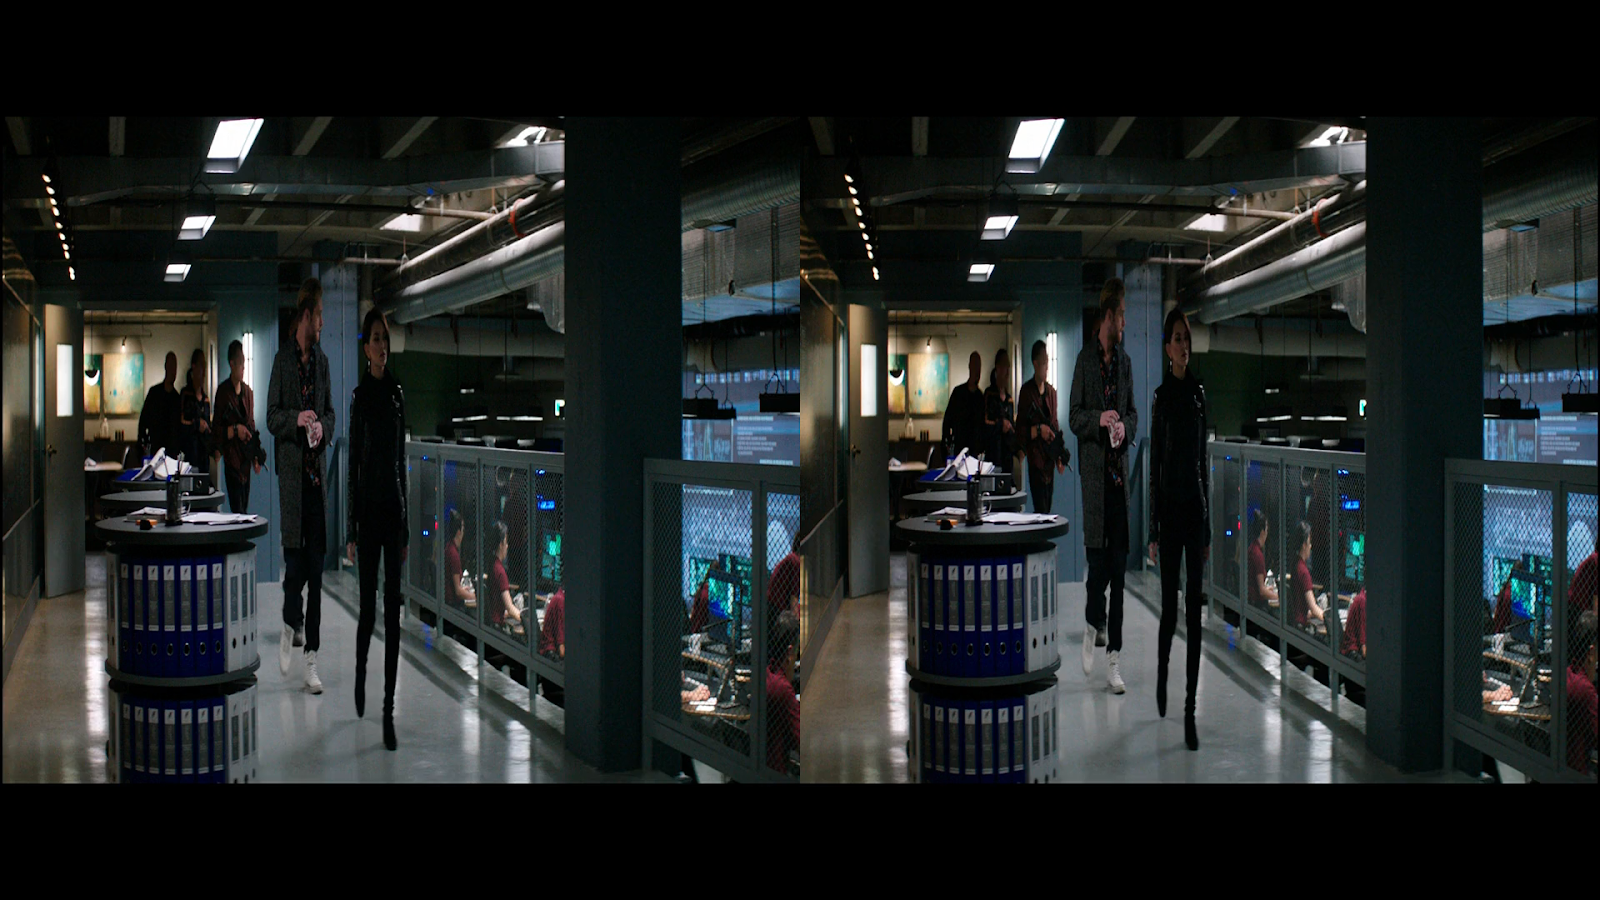 Rascacielos: Rescate en las Alturas (2018) 3D SBS Full 1080p Latino-Ingles captura 1